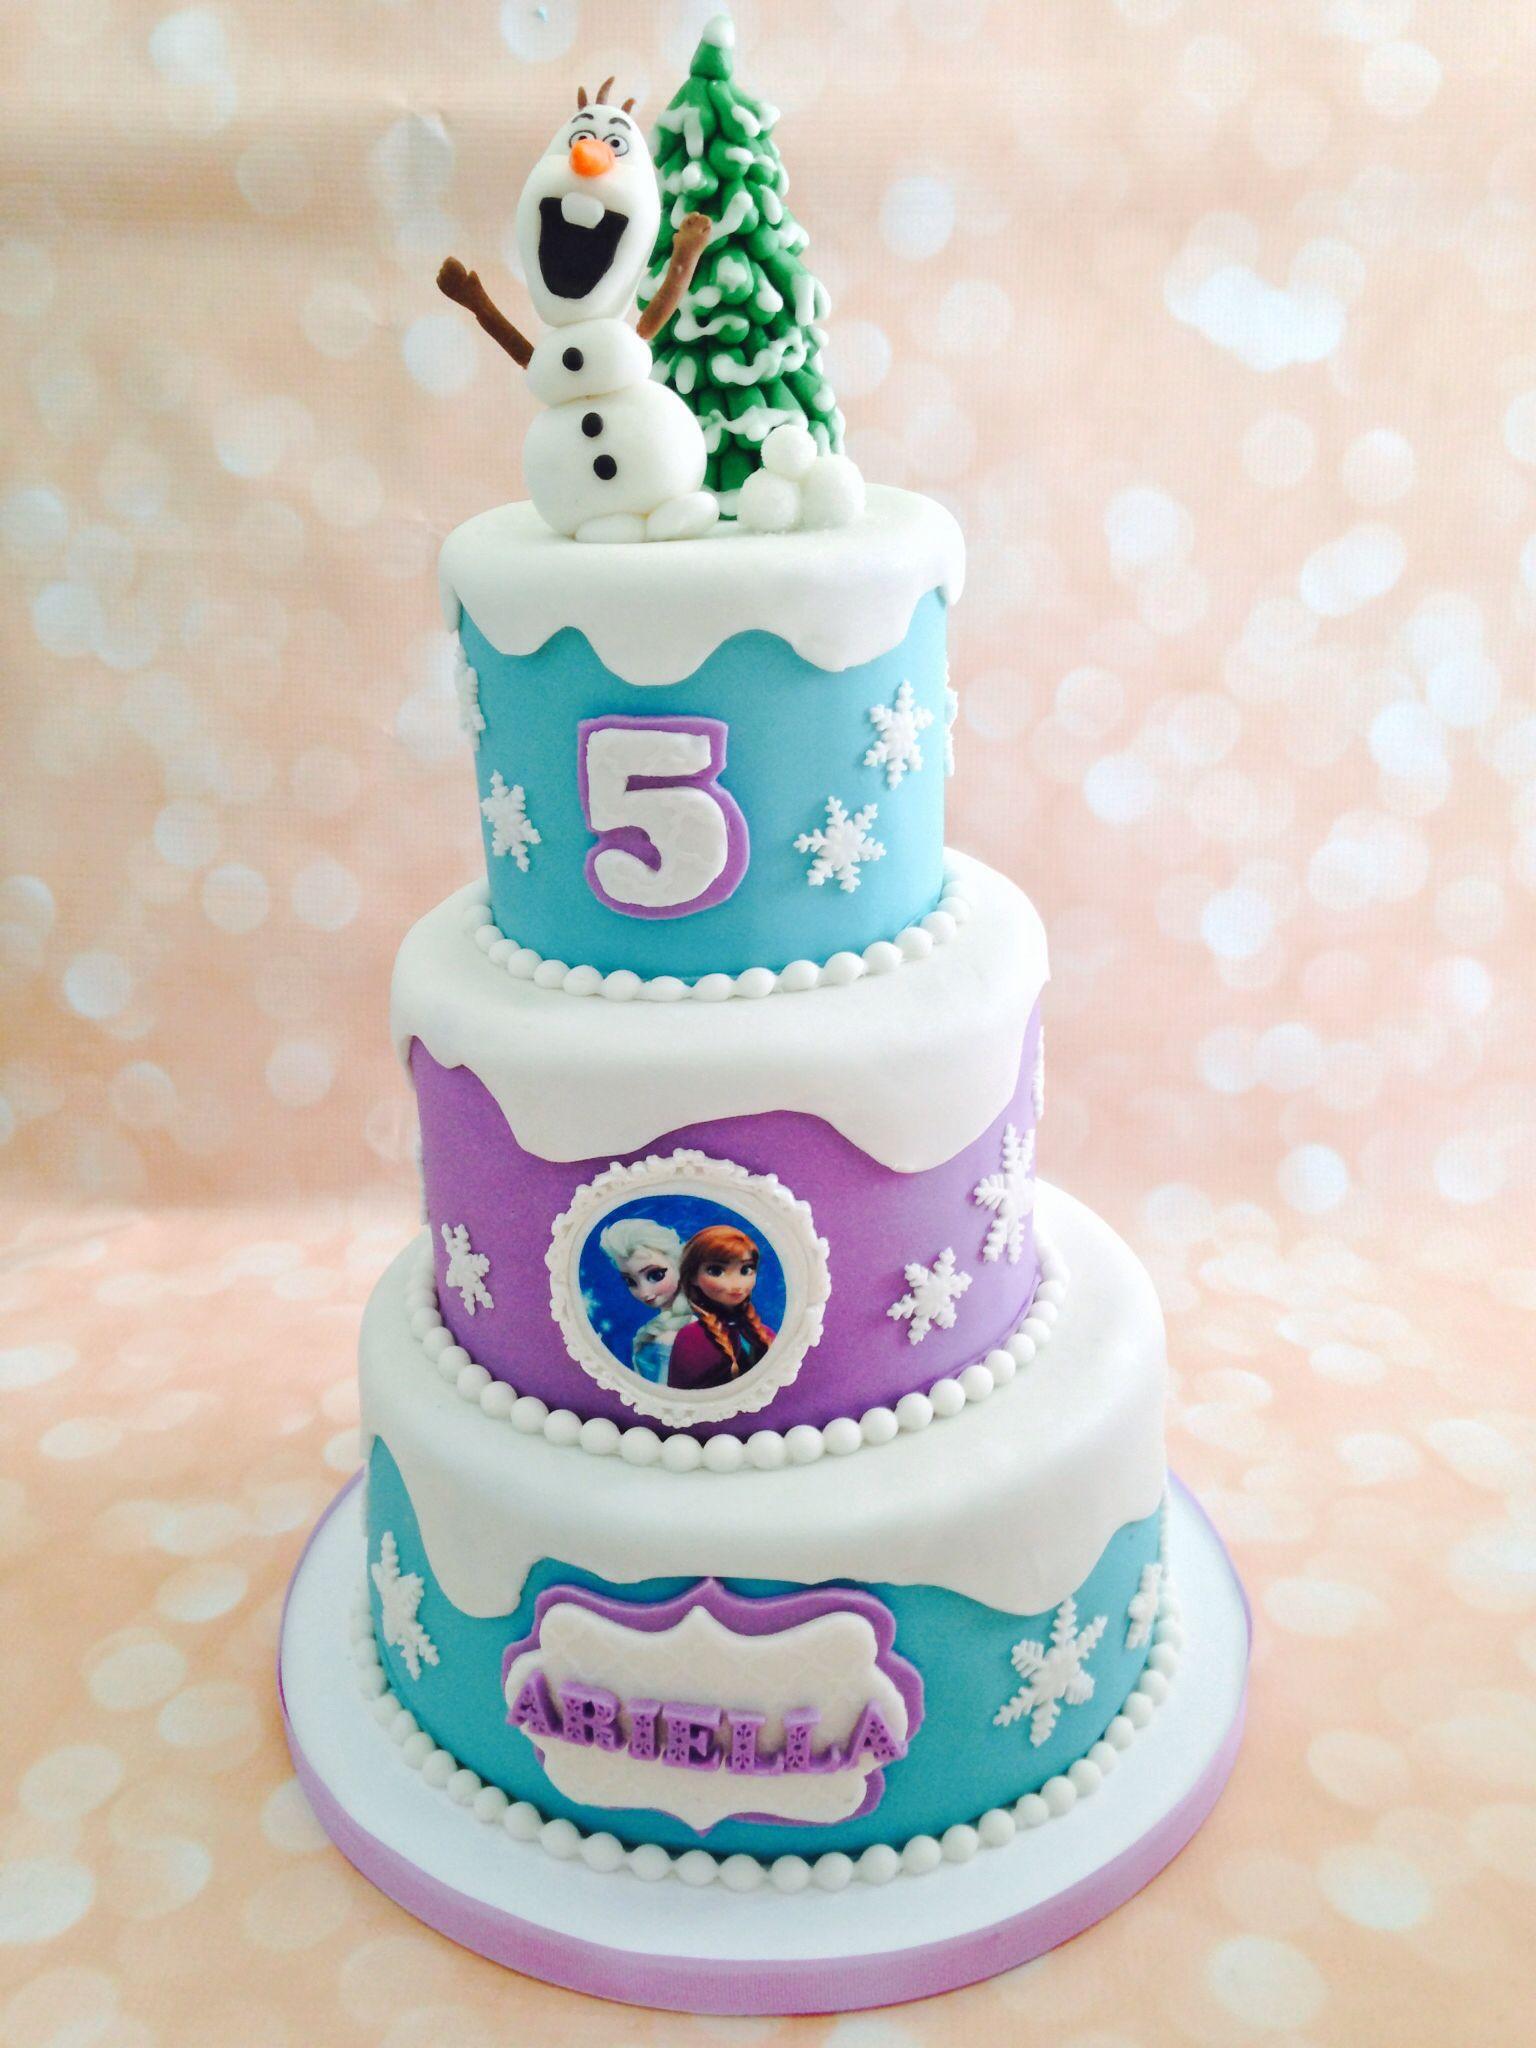 Frozen Party 3 Tier Cake